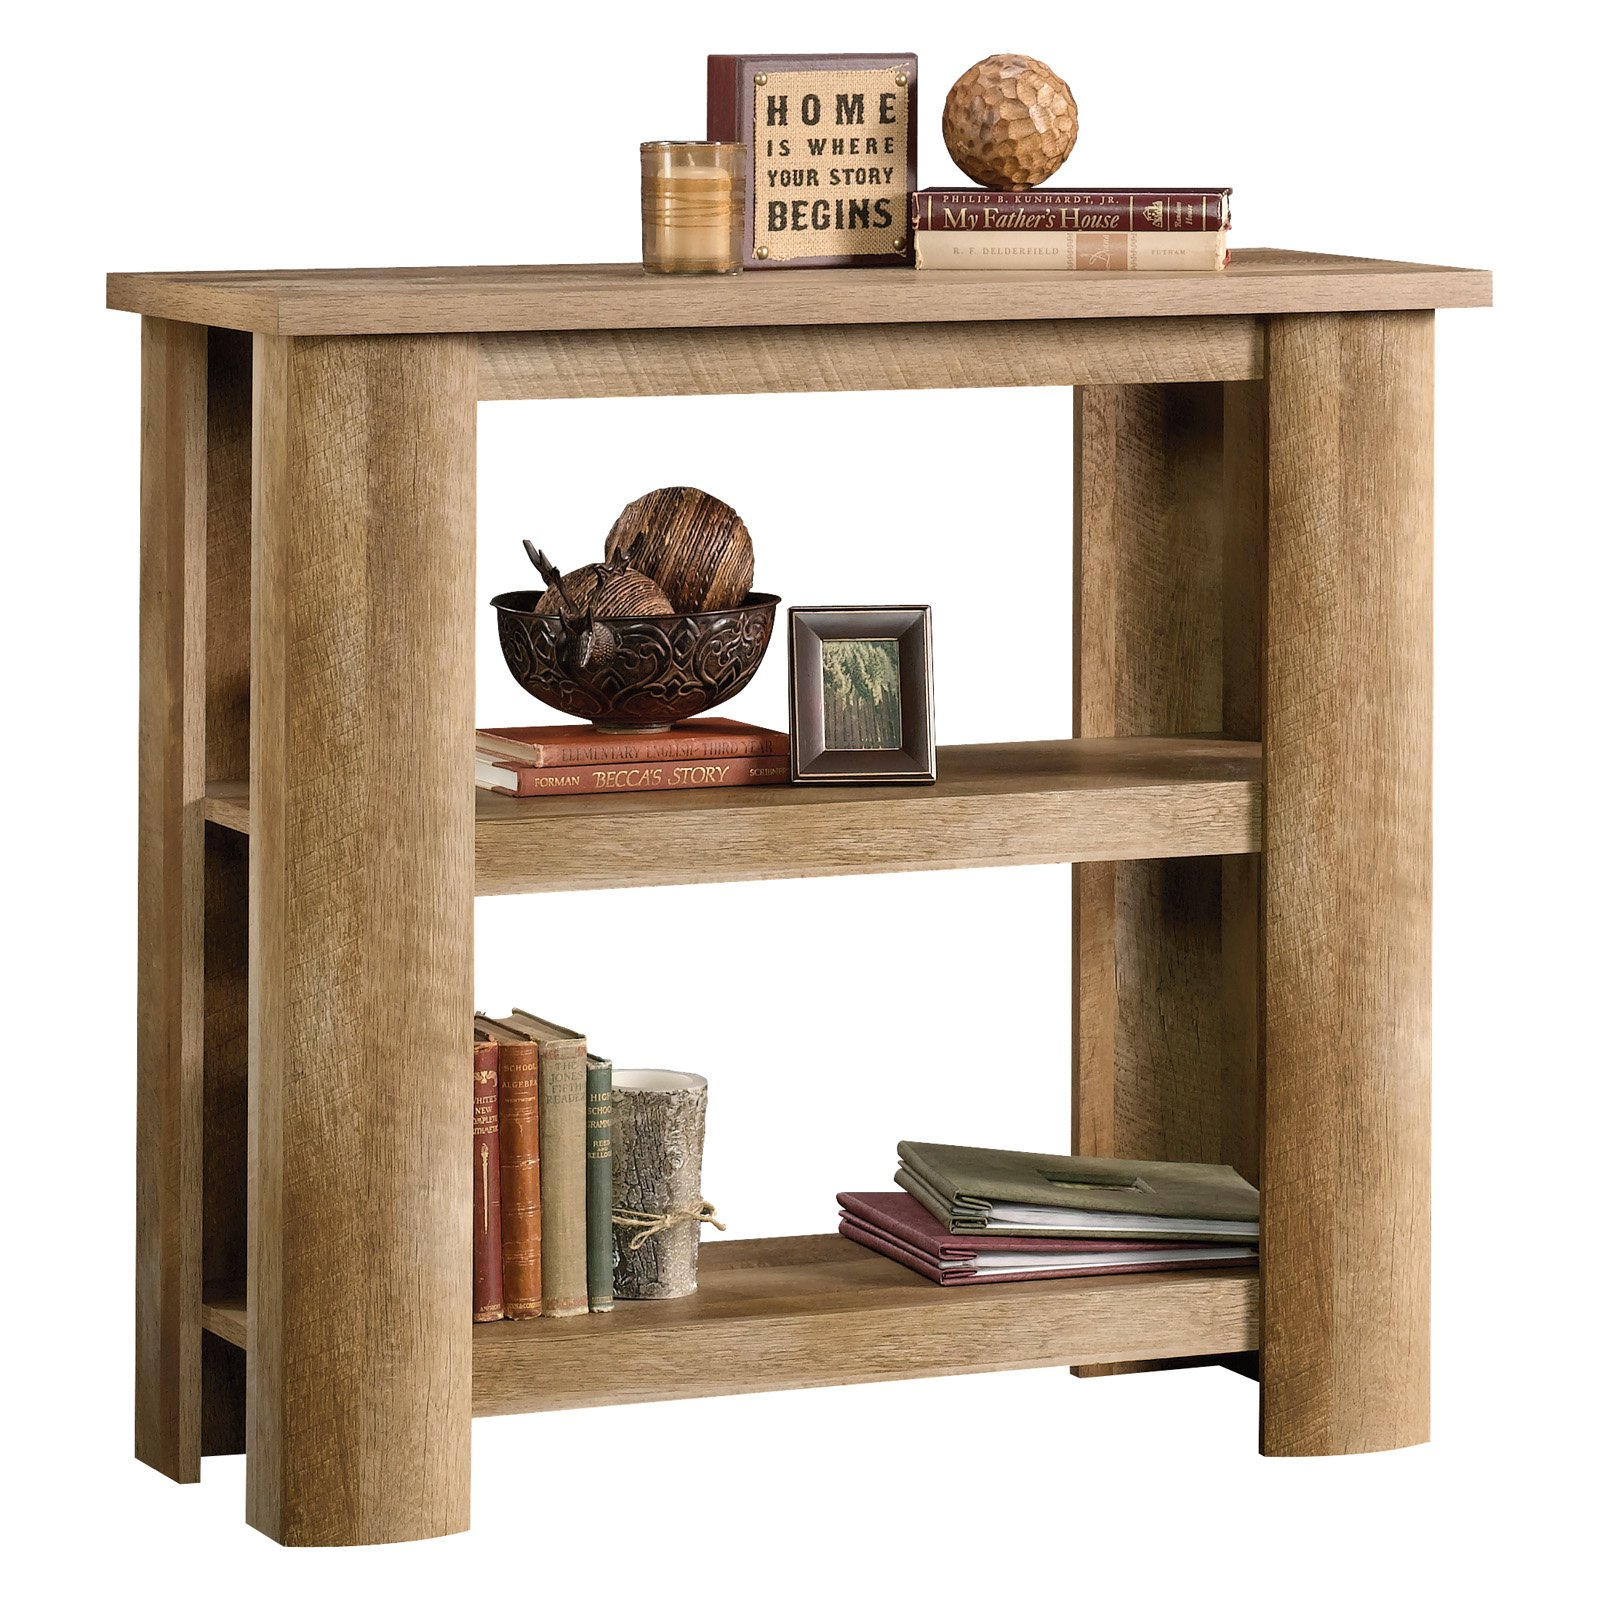 Sauder Boone Mountain 3 Shelf Bookcase in Craftsman Oak